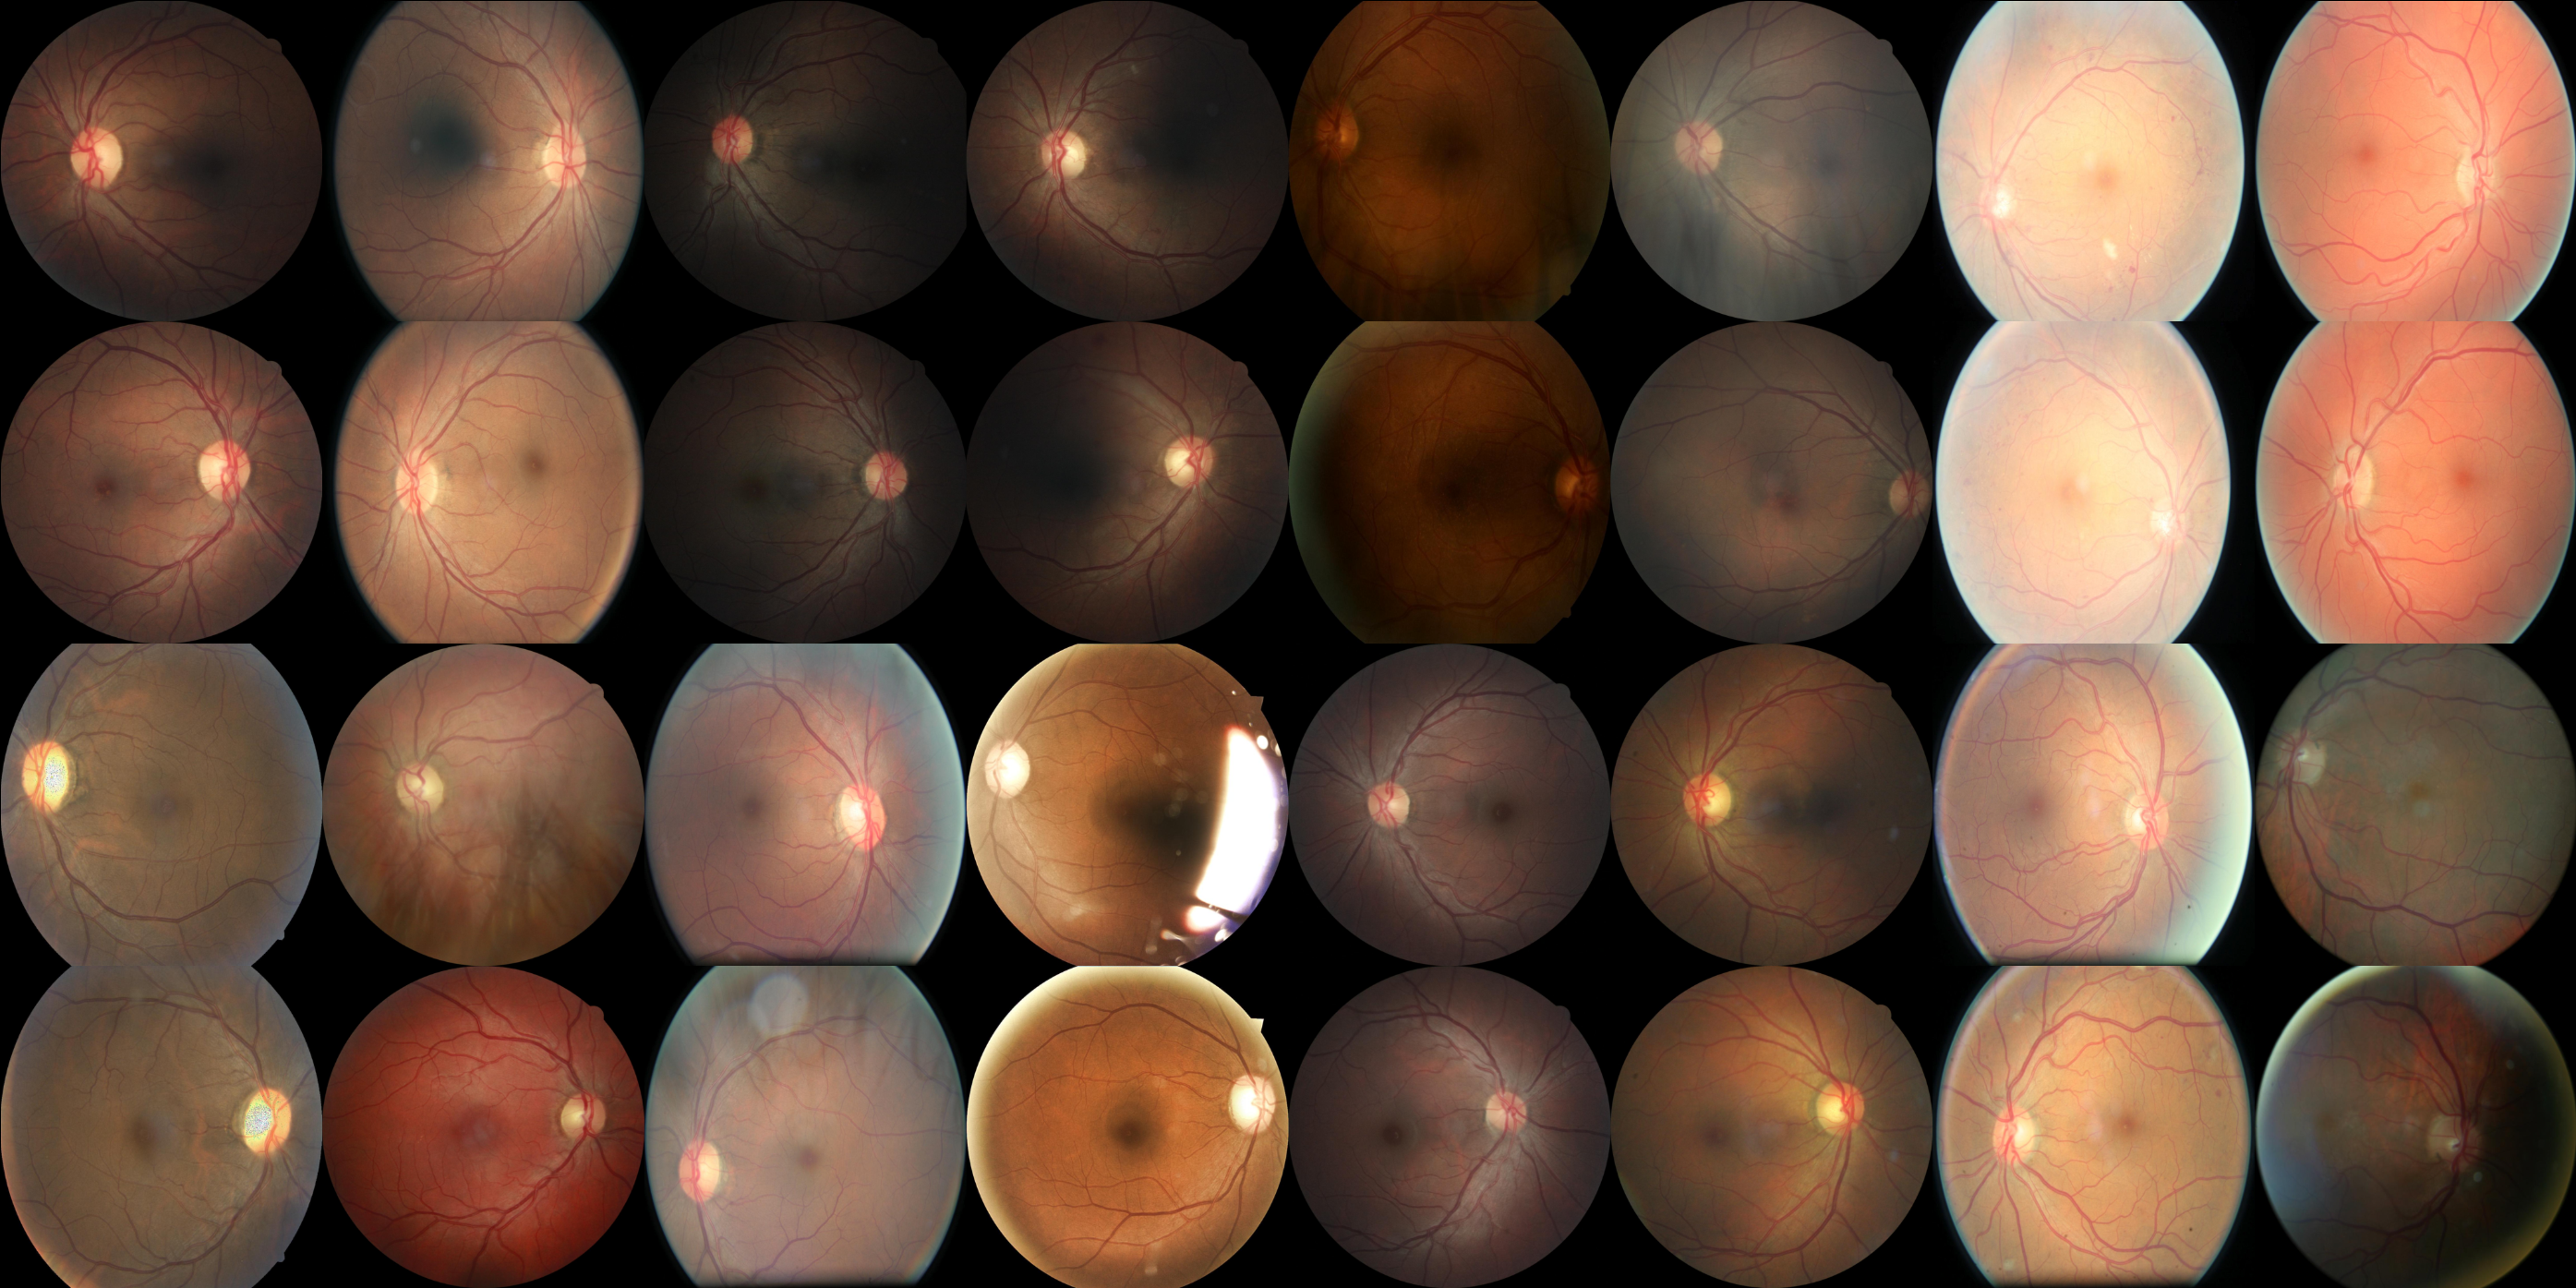 Detecting diabetic retinopathy in eye images - 菜鸡一枚 - 博客园